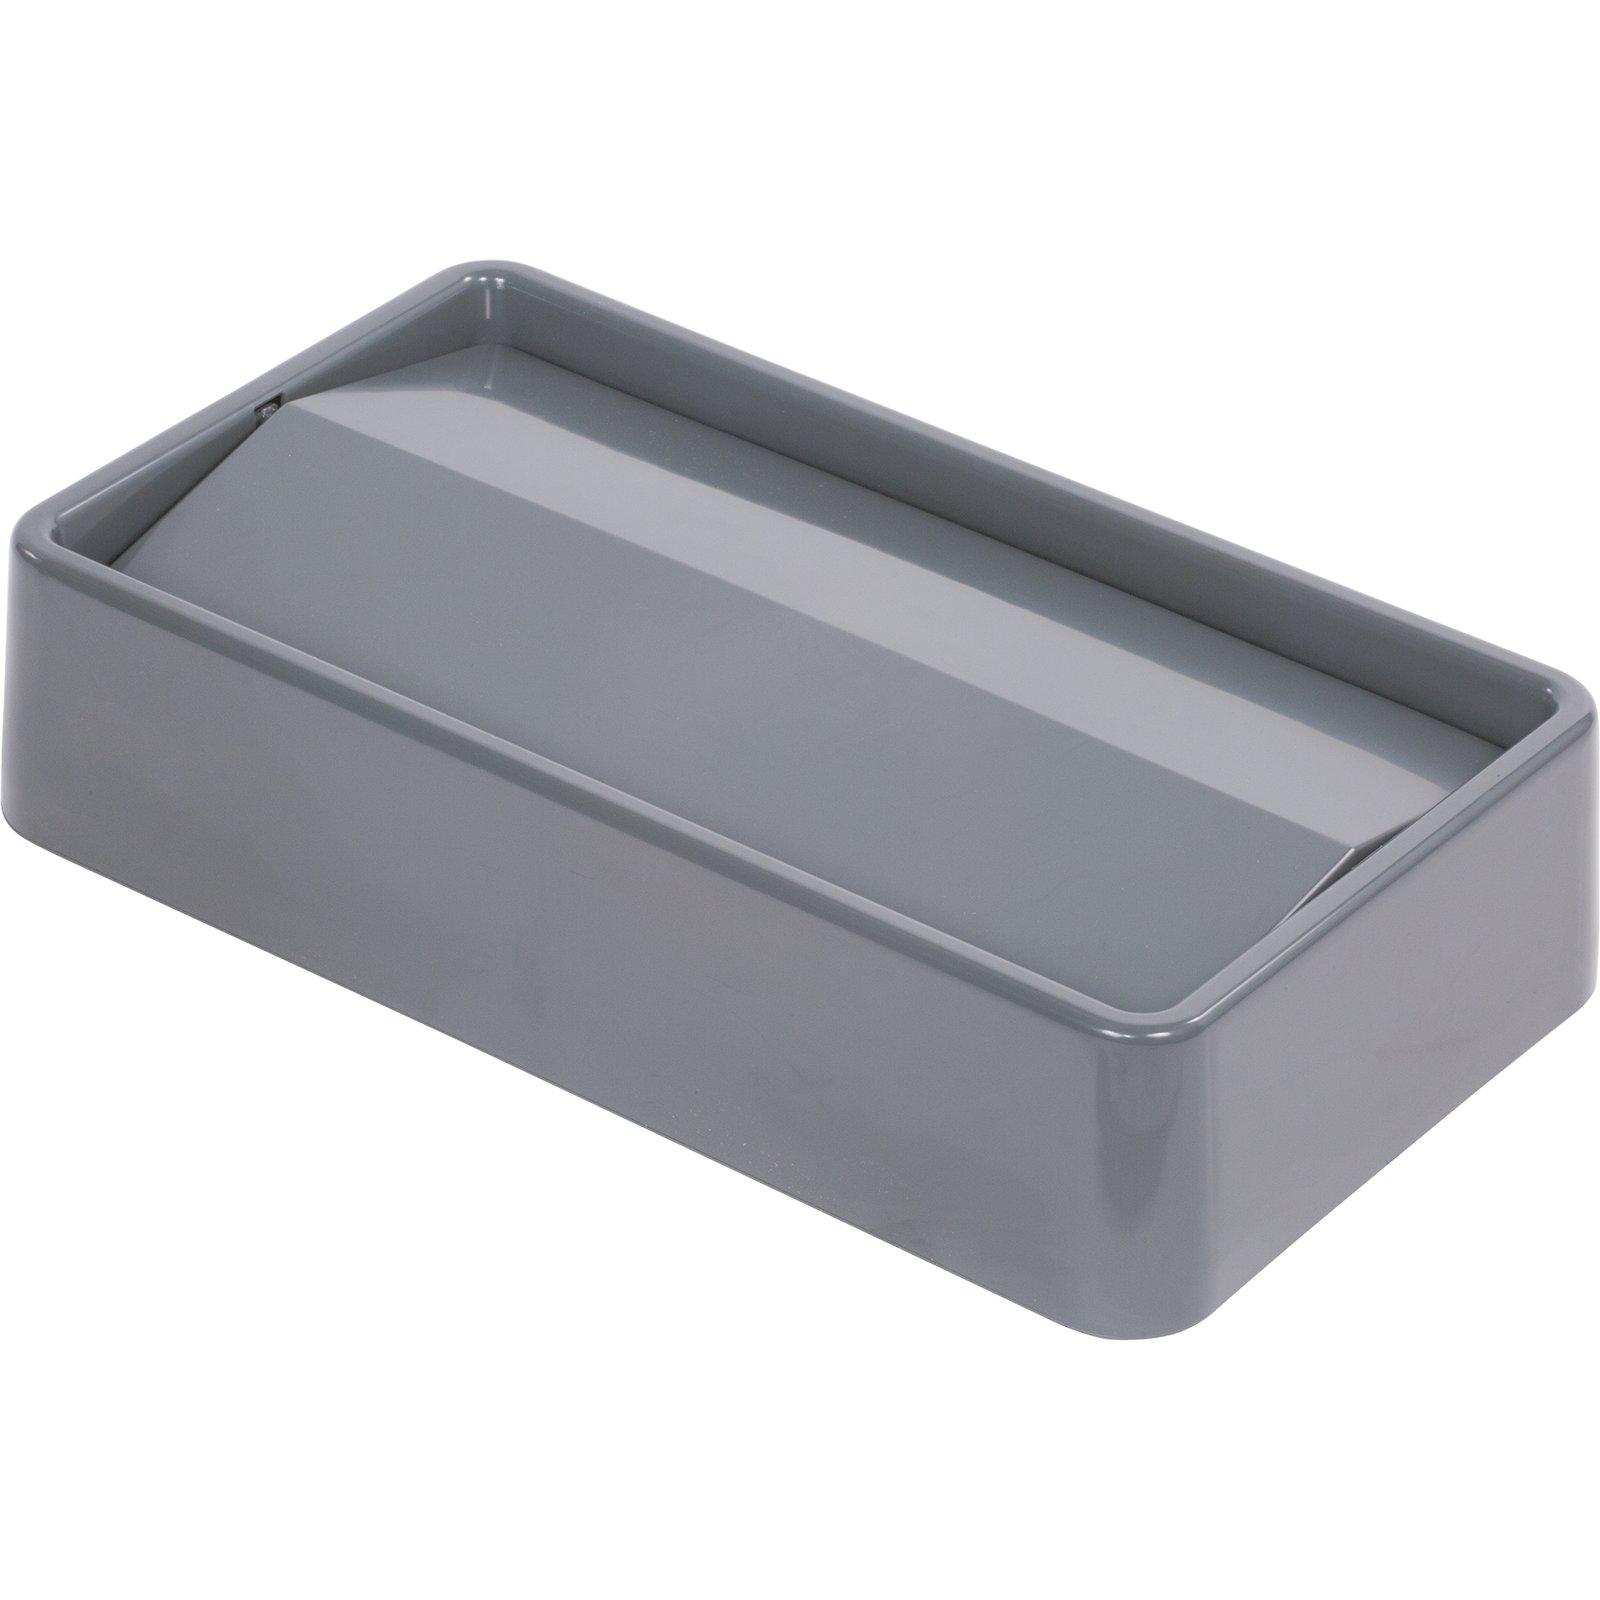 3700-411 Carlisle Gray Trash Receptacle Lid / Top